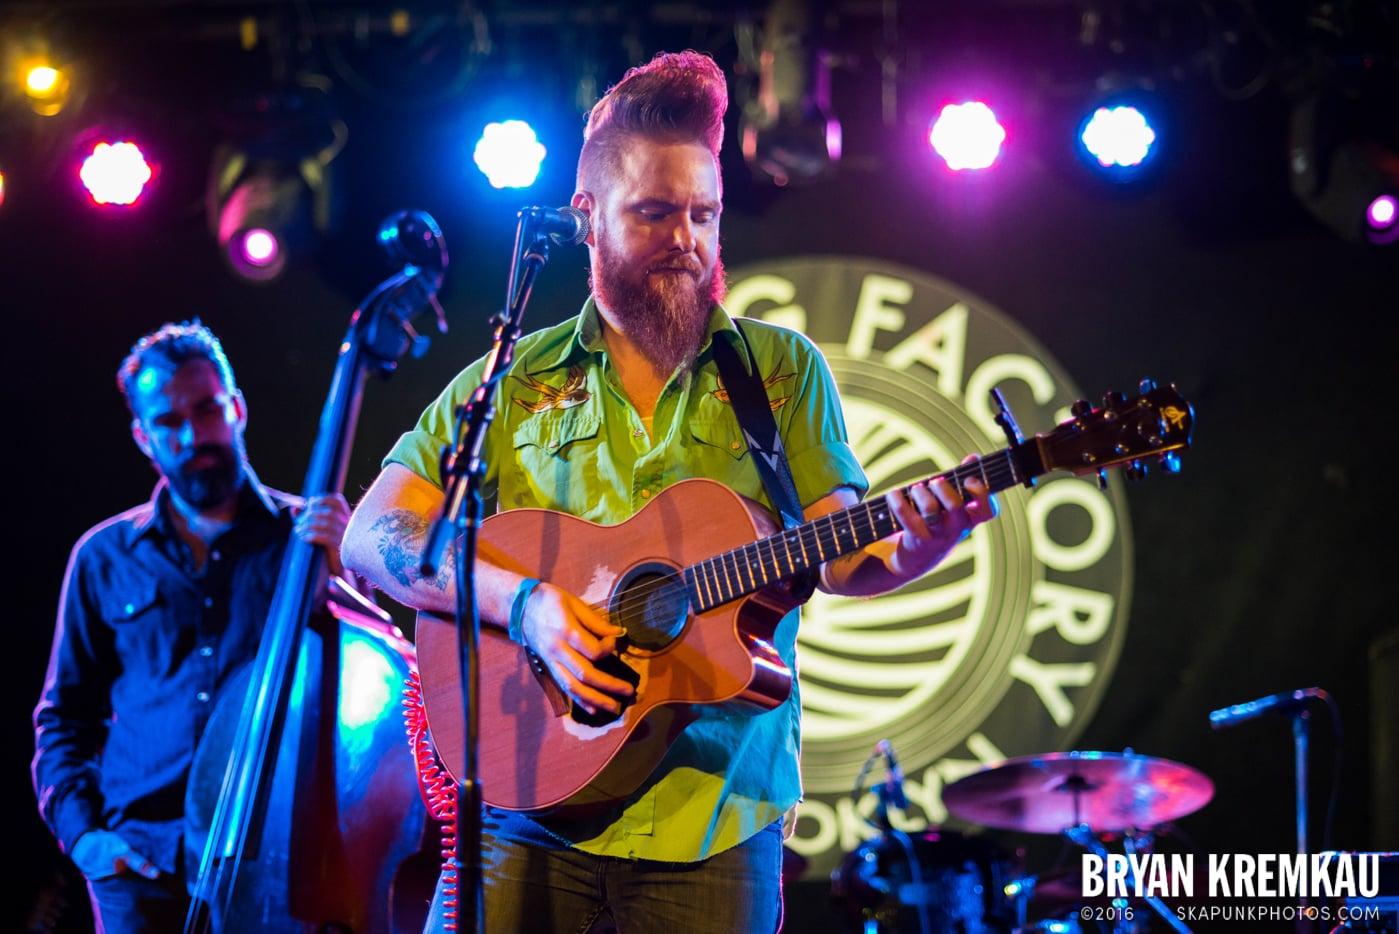 Danny Burns Band @ Knitting Factory, Brooklyn, NY - 9.10.14 (16)